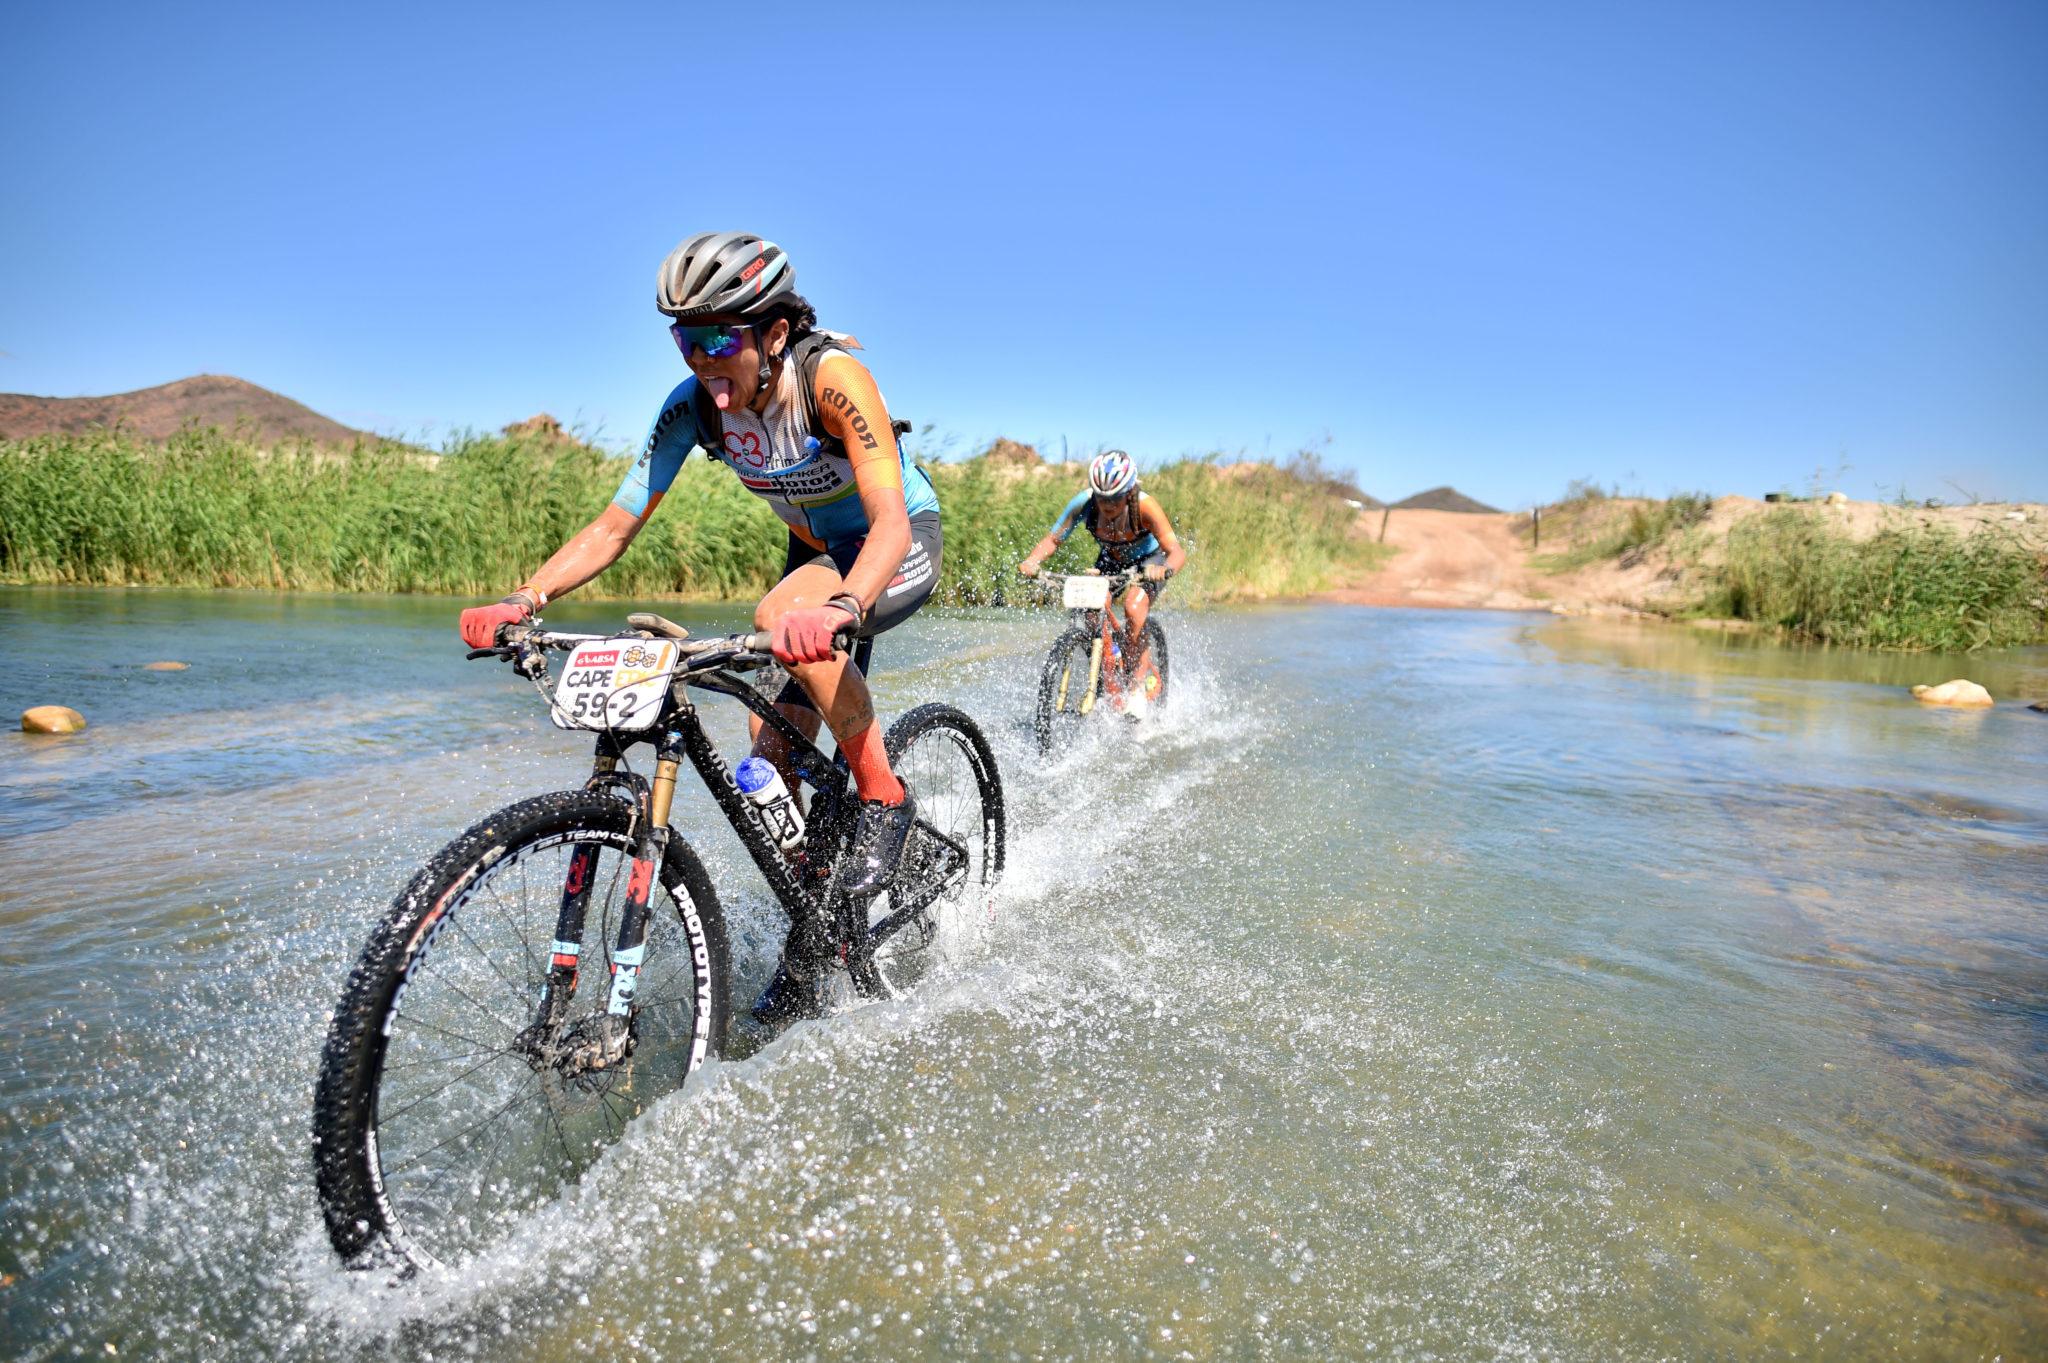 Raiza e Margot cruzam rio no fim da etapa (Bernhard Glessing / Sportograf)